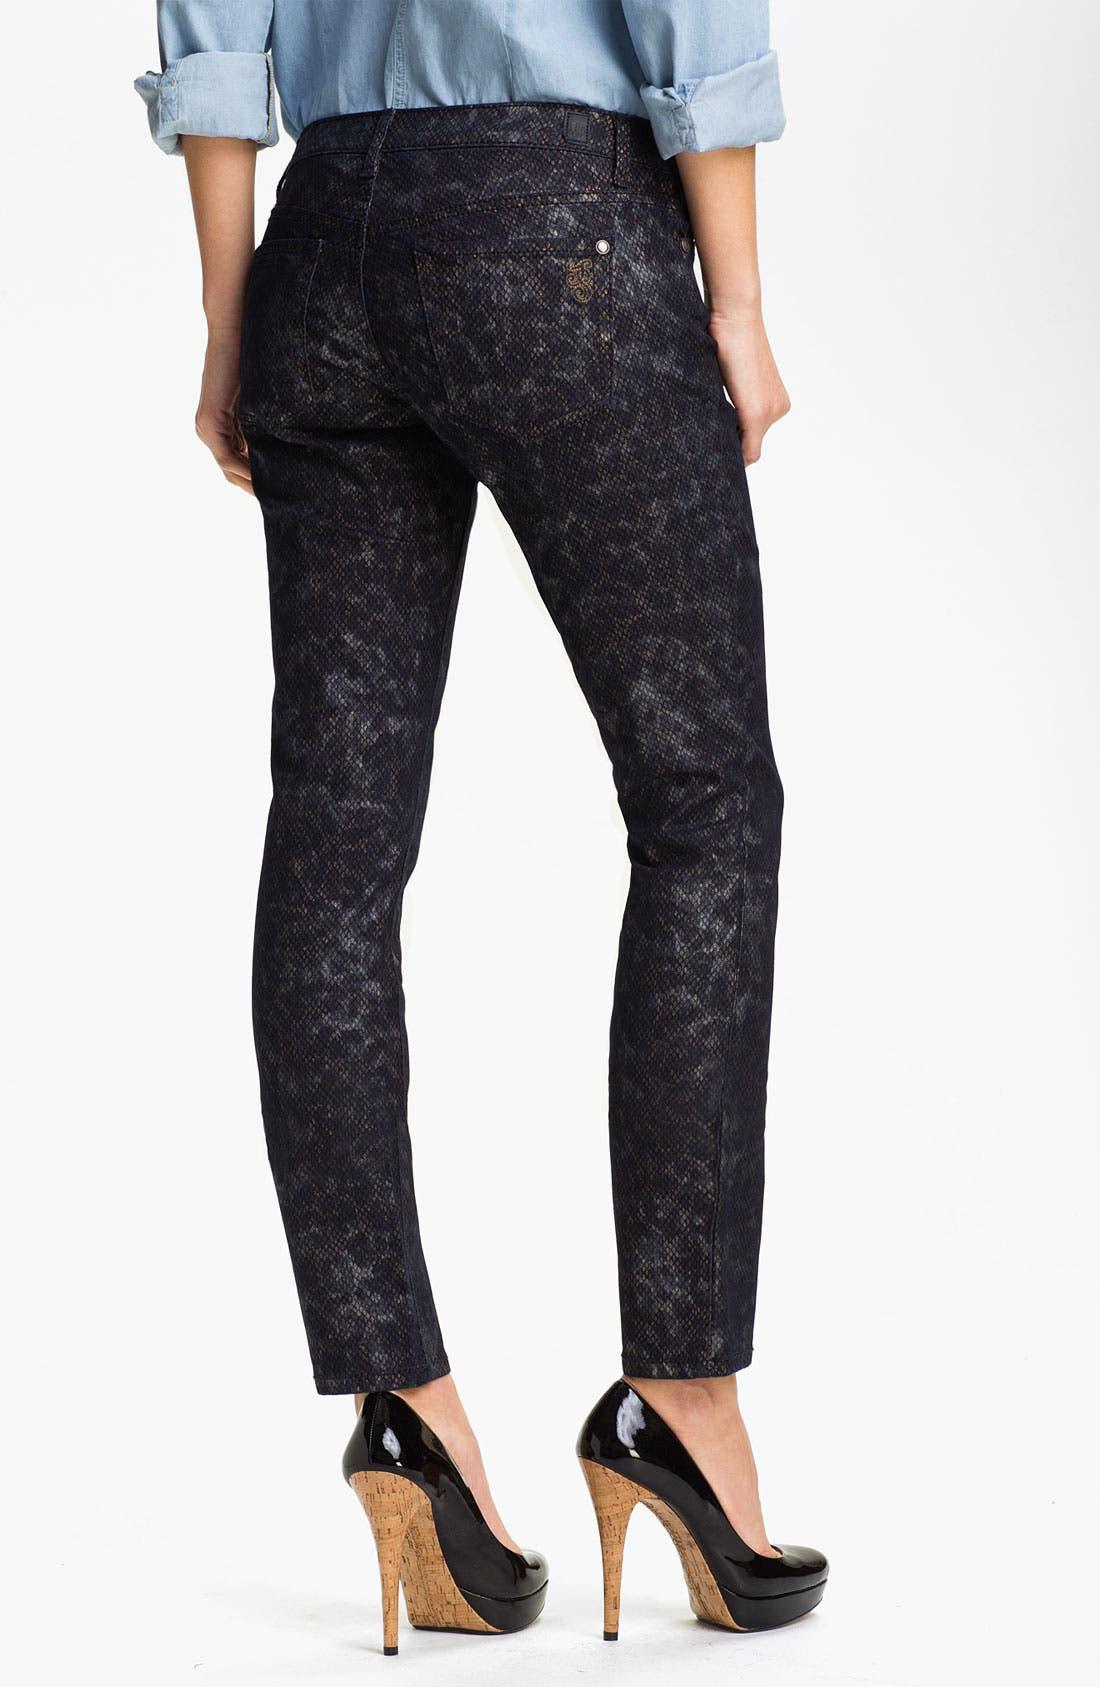 Alternate Image 2  - Jessica Simpson 'Forever' Snakeskin Print Skinny Jeans (Online Exclusive)